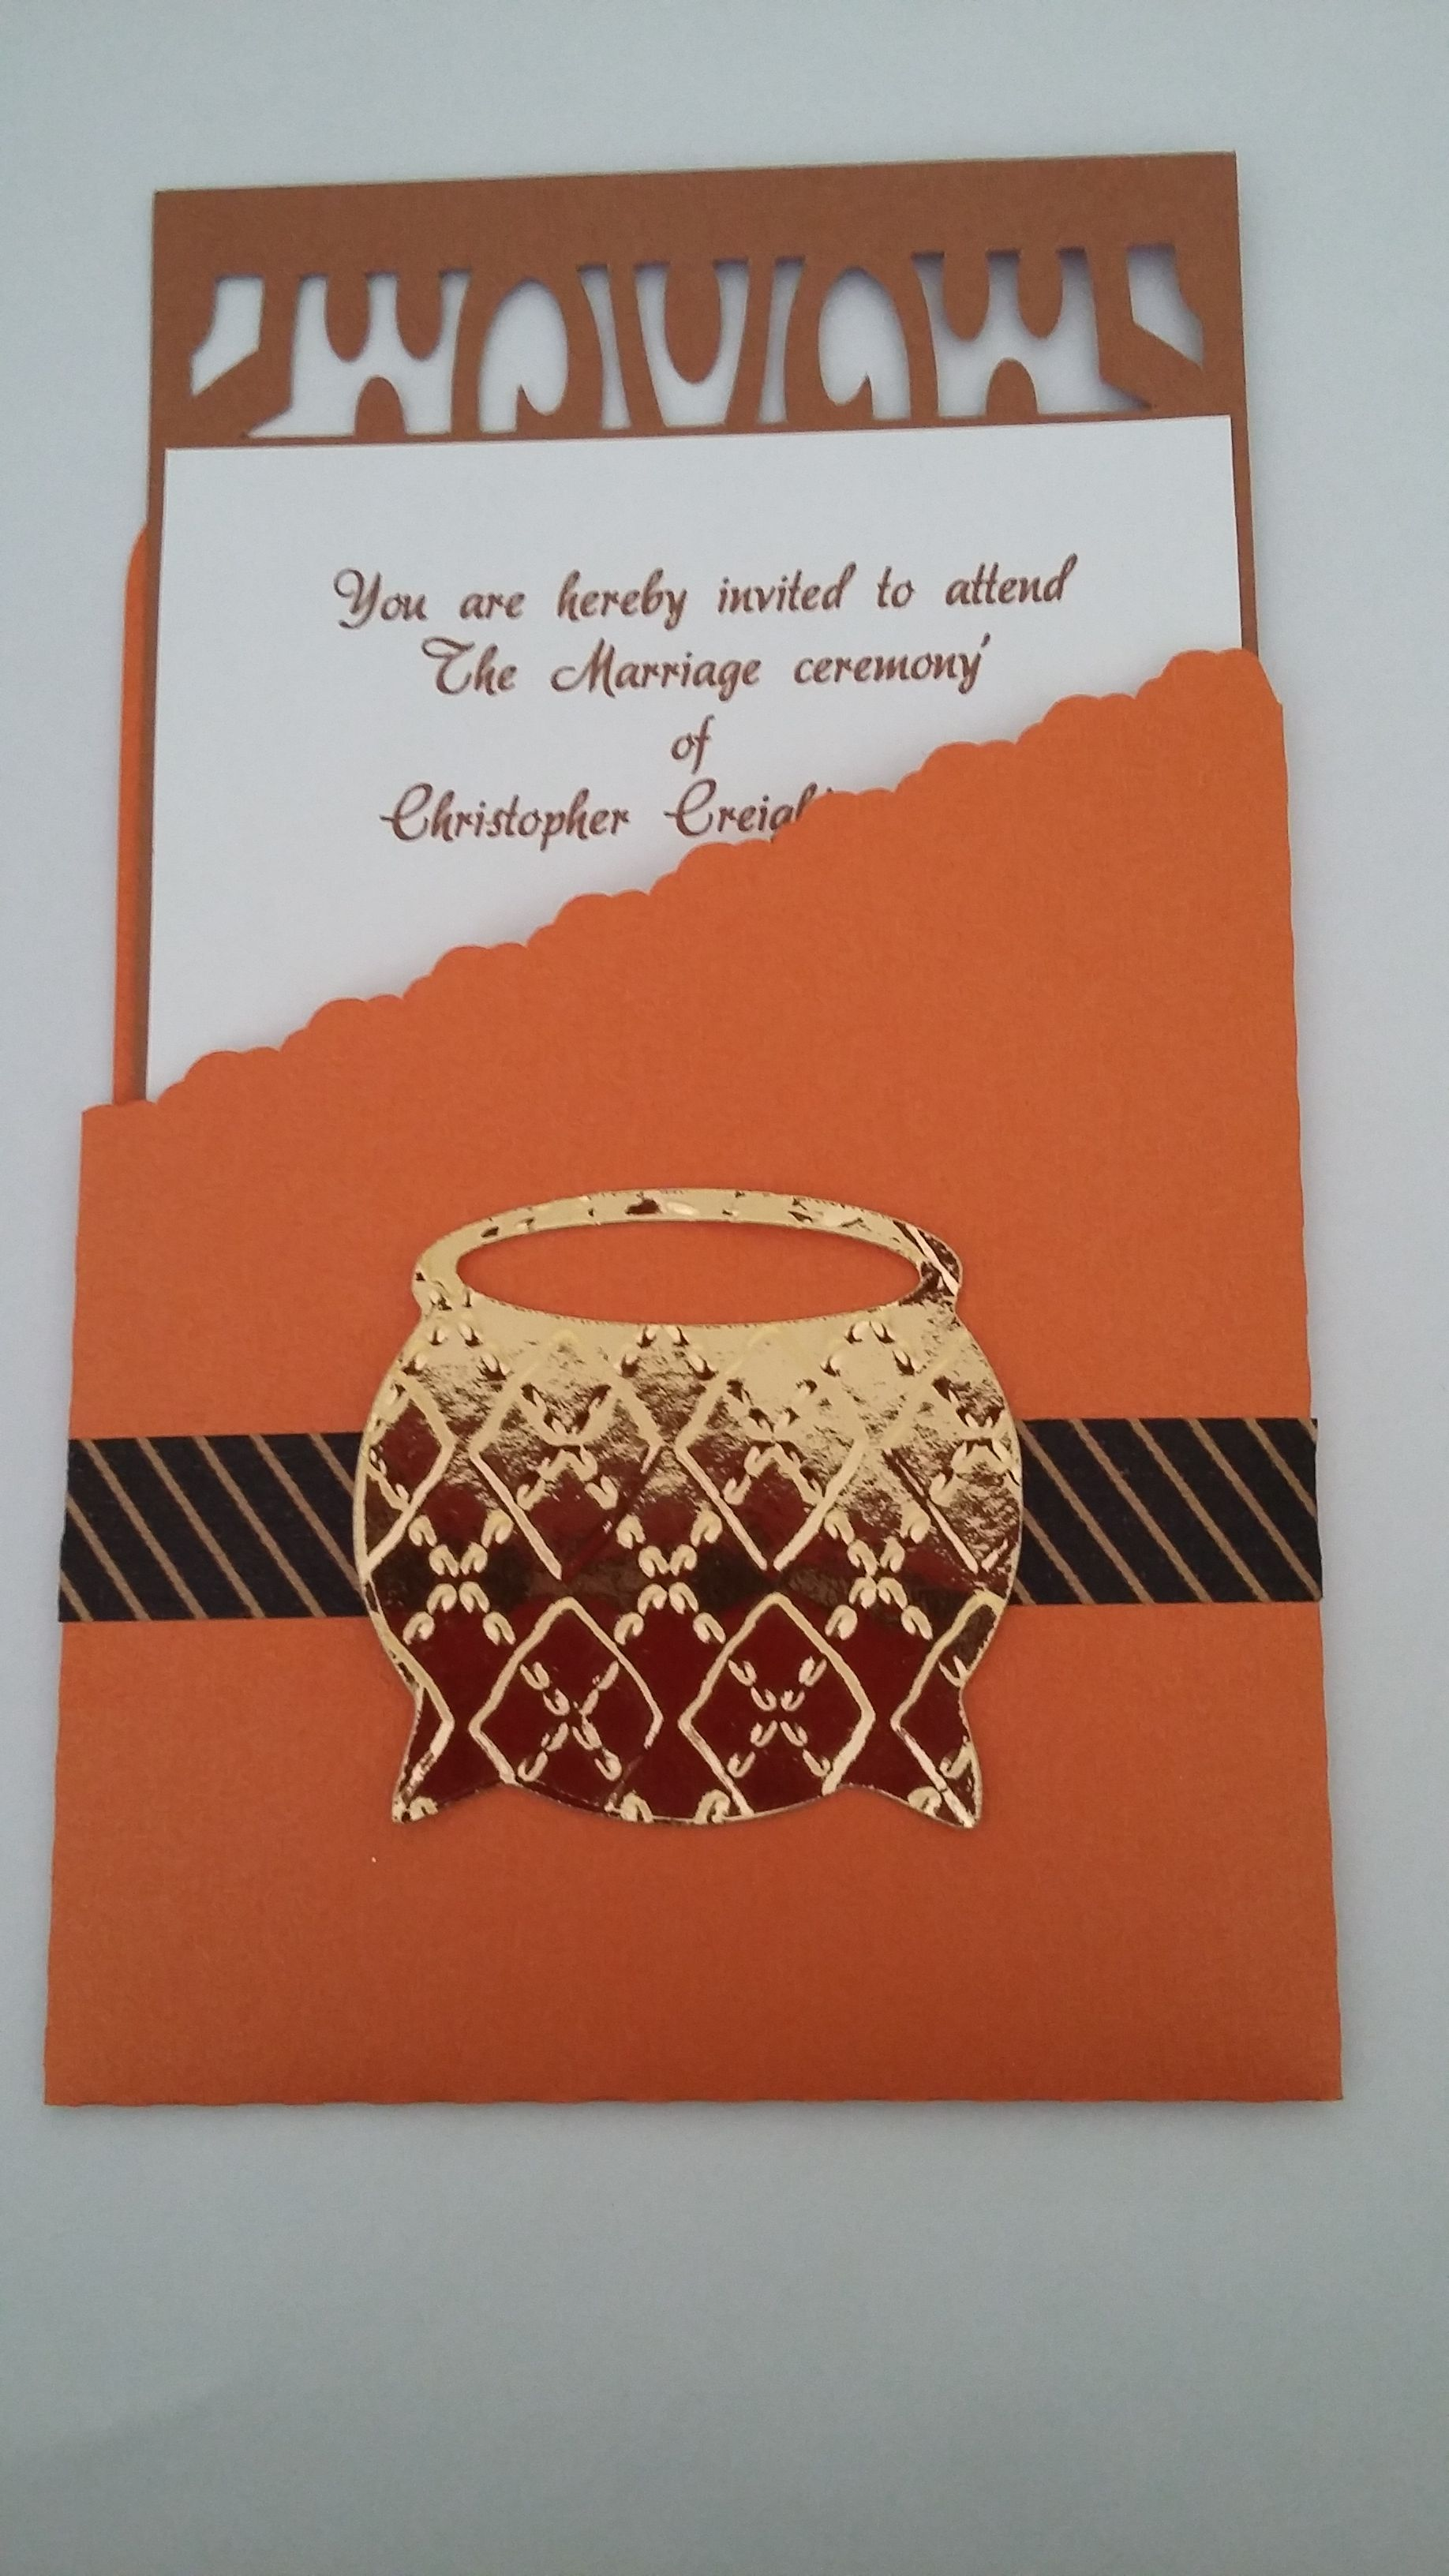 Traditional zulu wedding invitation card all the best ideas about traditional zulu weddingumembeso card copyright creative flair 0829445889 creative stopboris Image collections